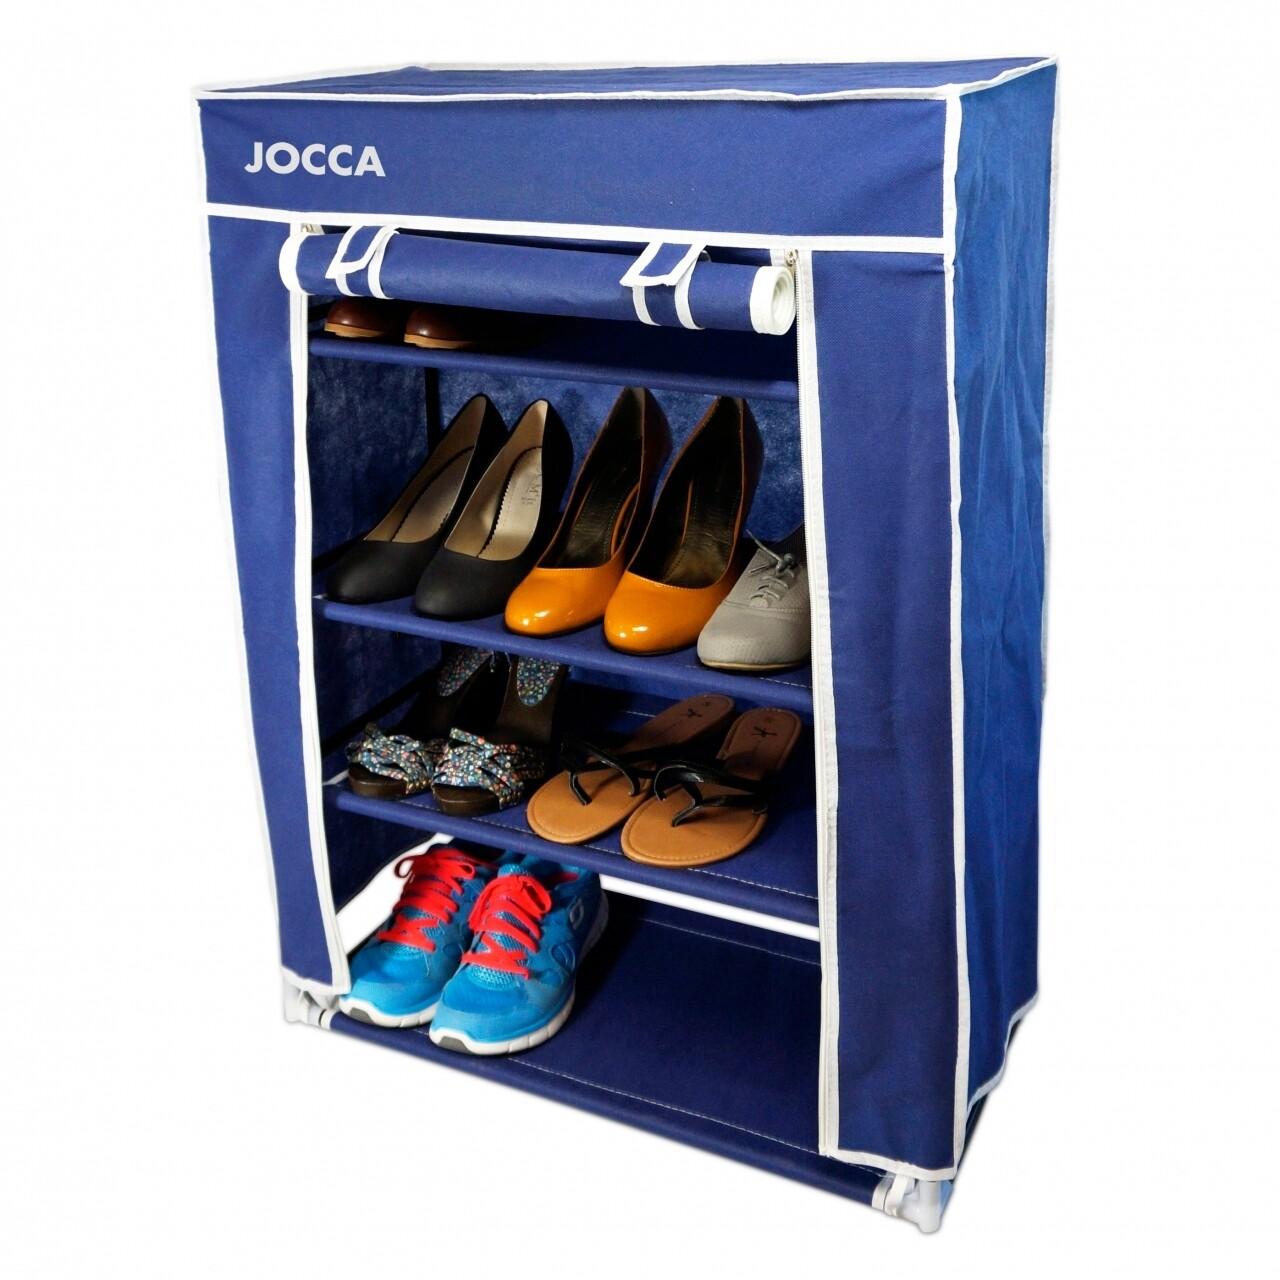 Organizator pentru pantofi Blue, Jocca, 30 x 60 x 80 cm, polipropilena/metal, albastru/alb